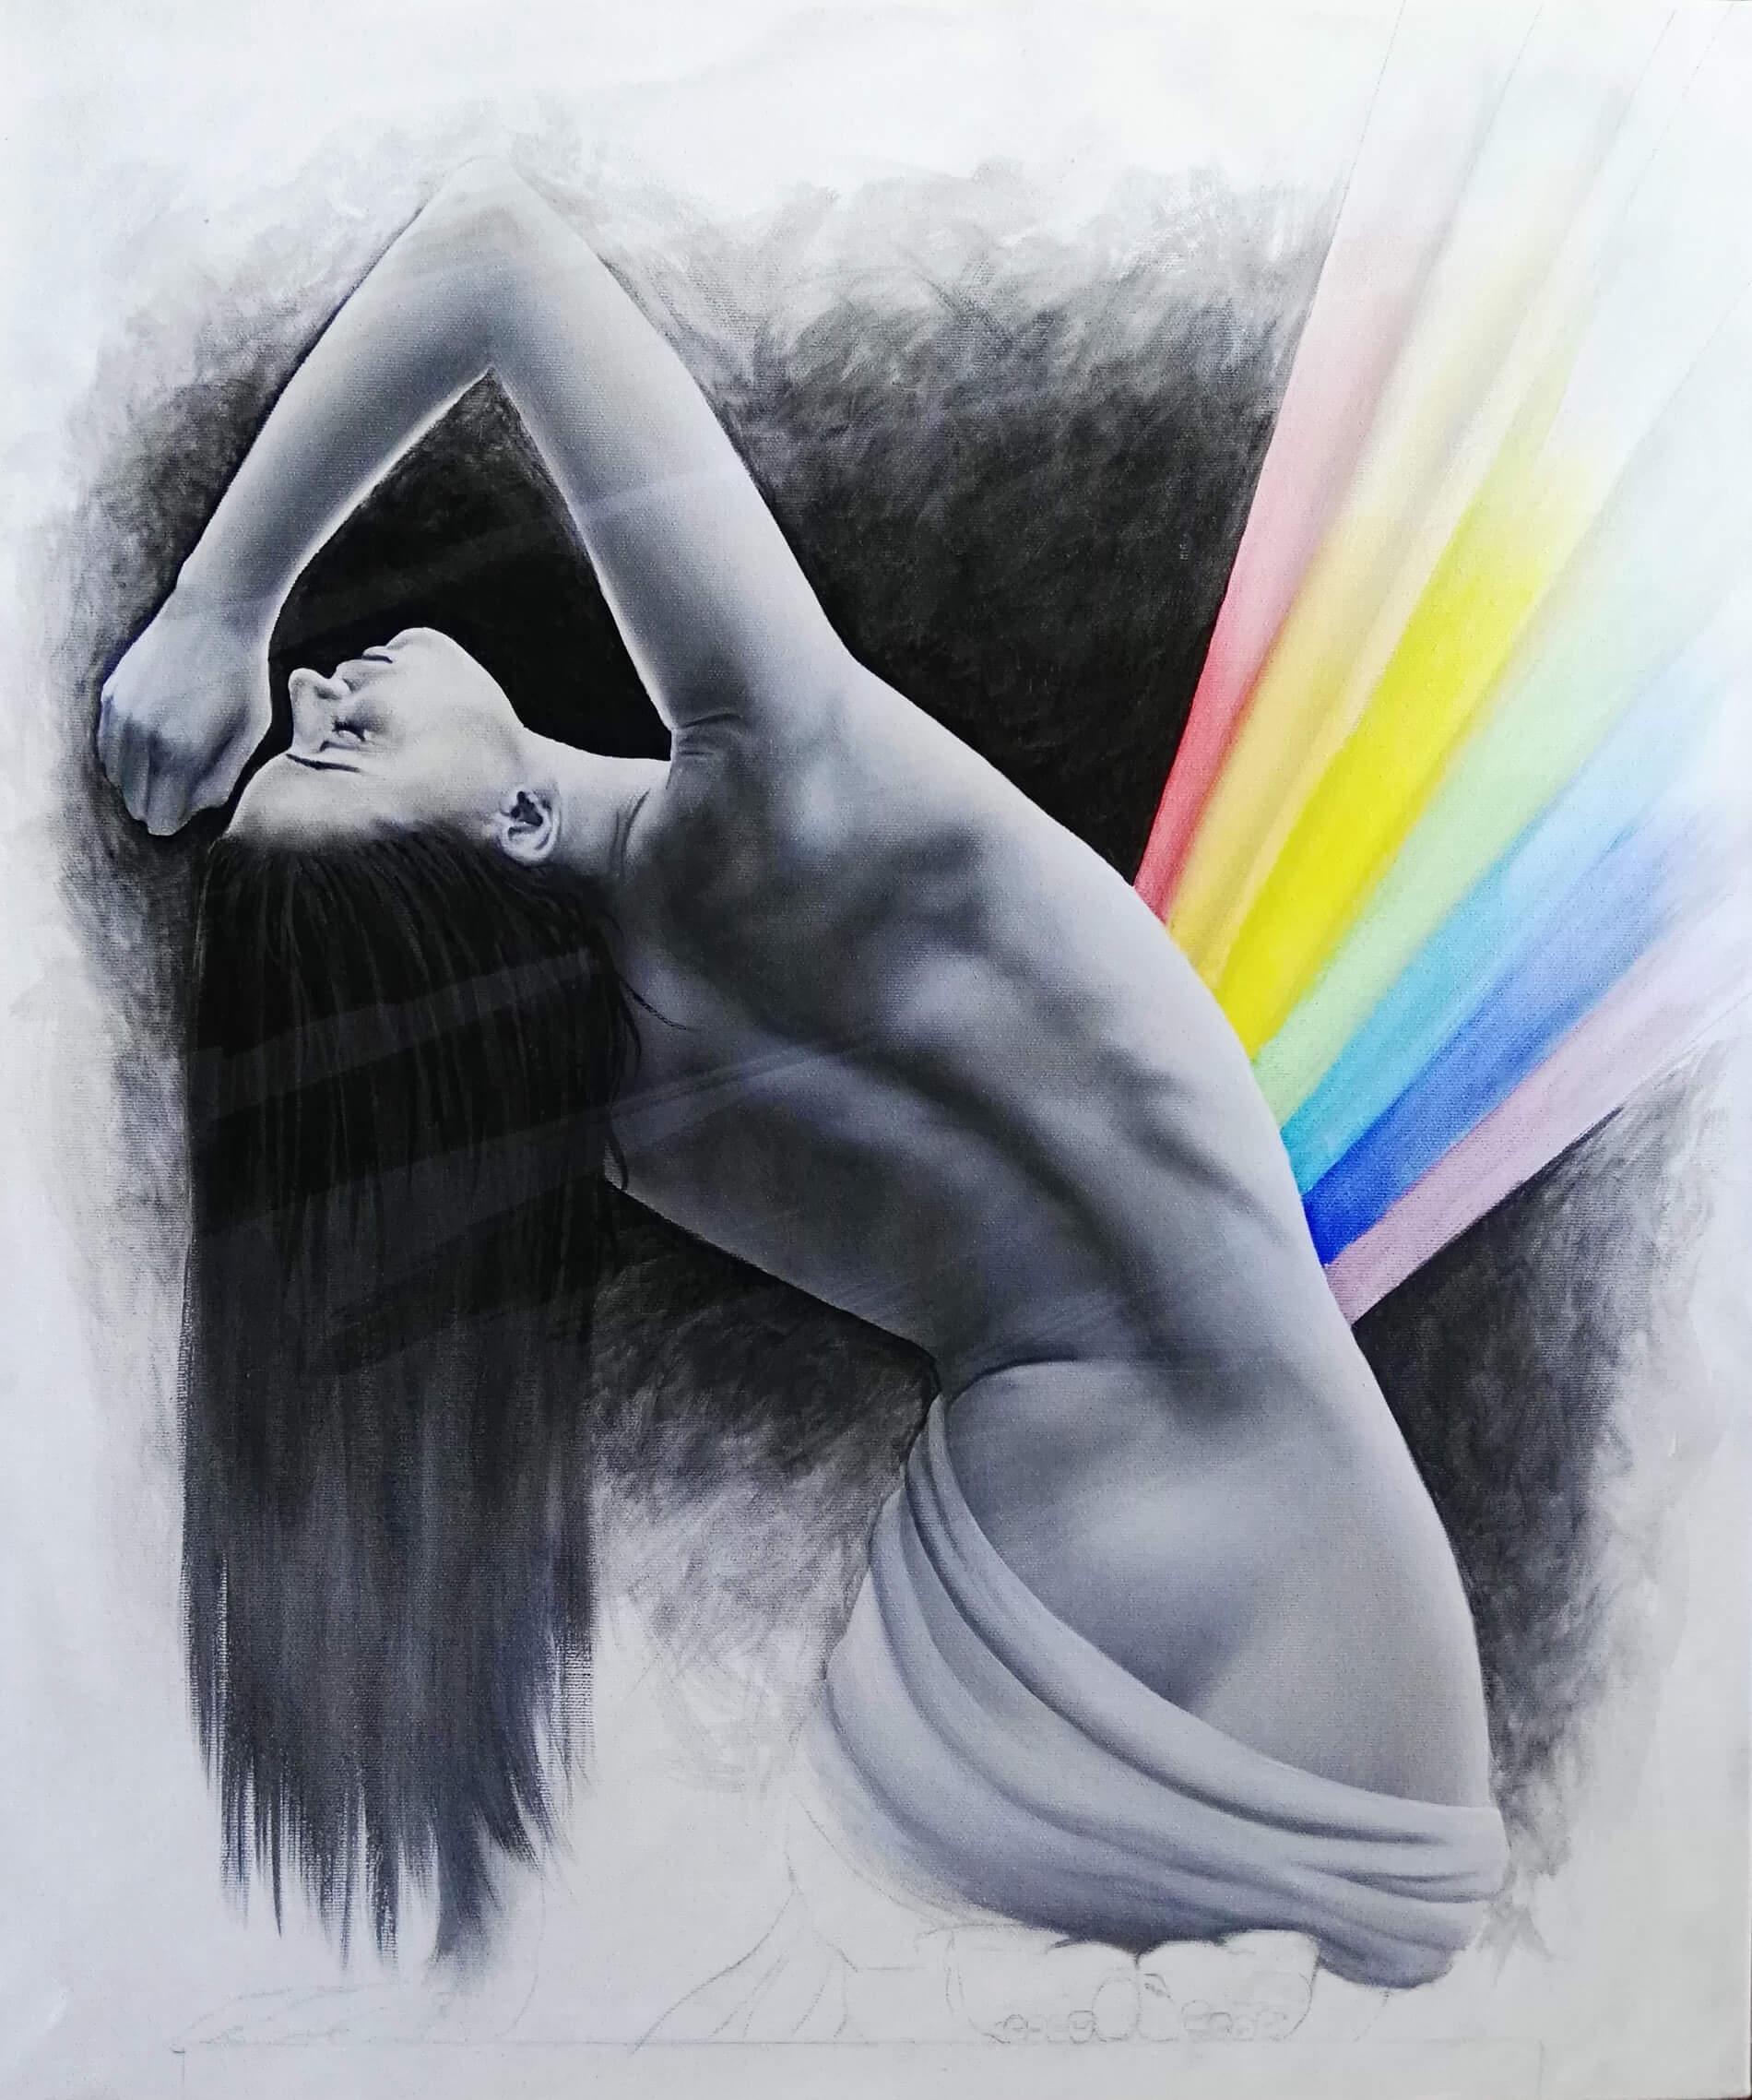 L'Arcobaleno Dentro